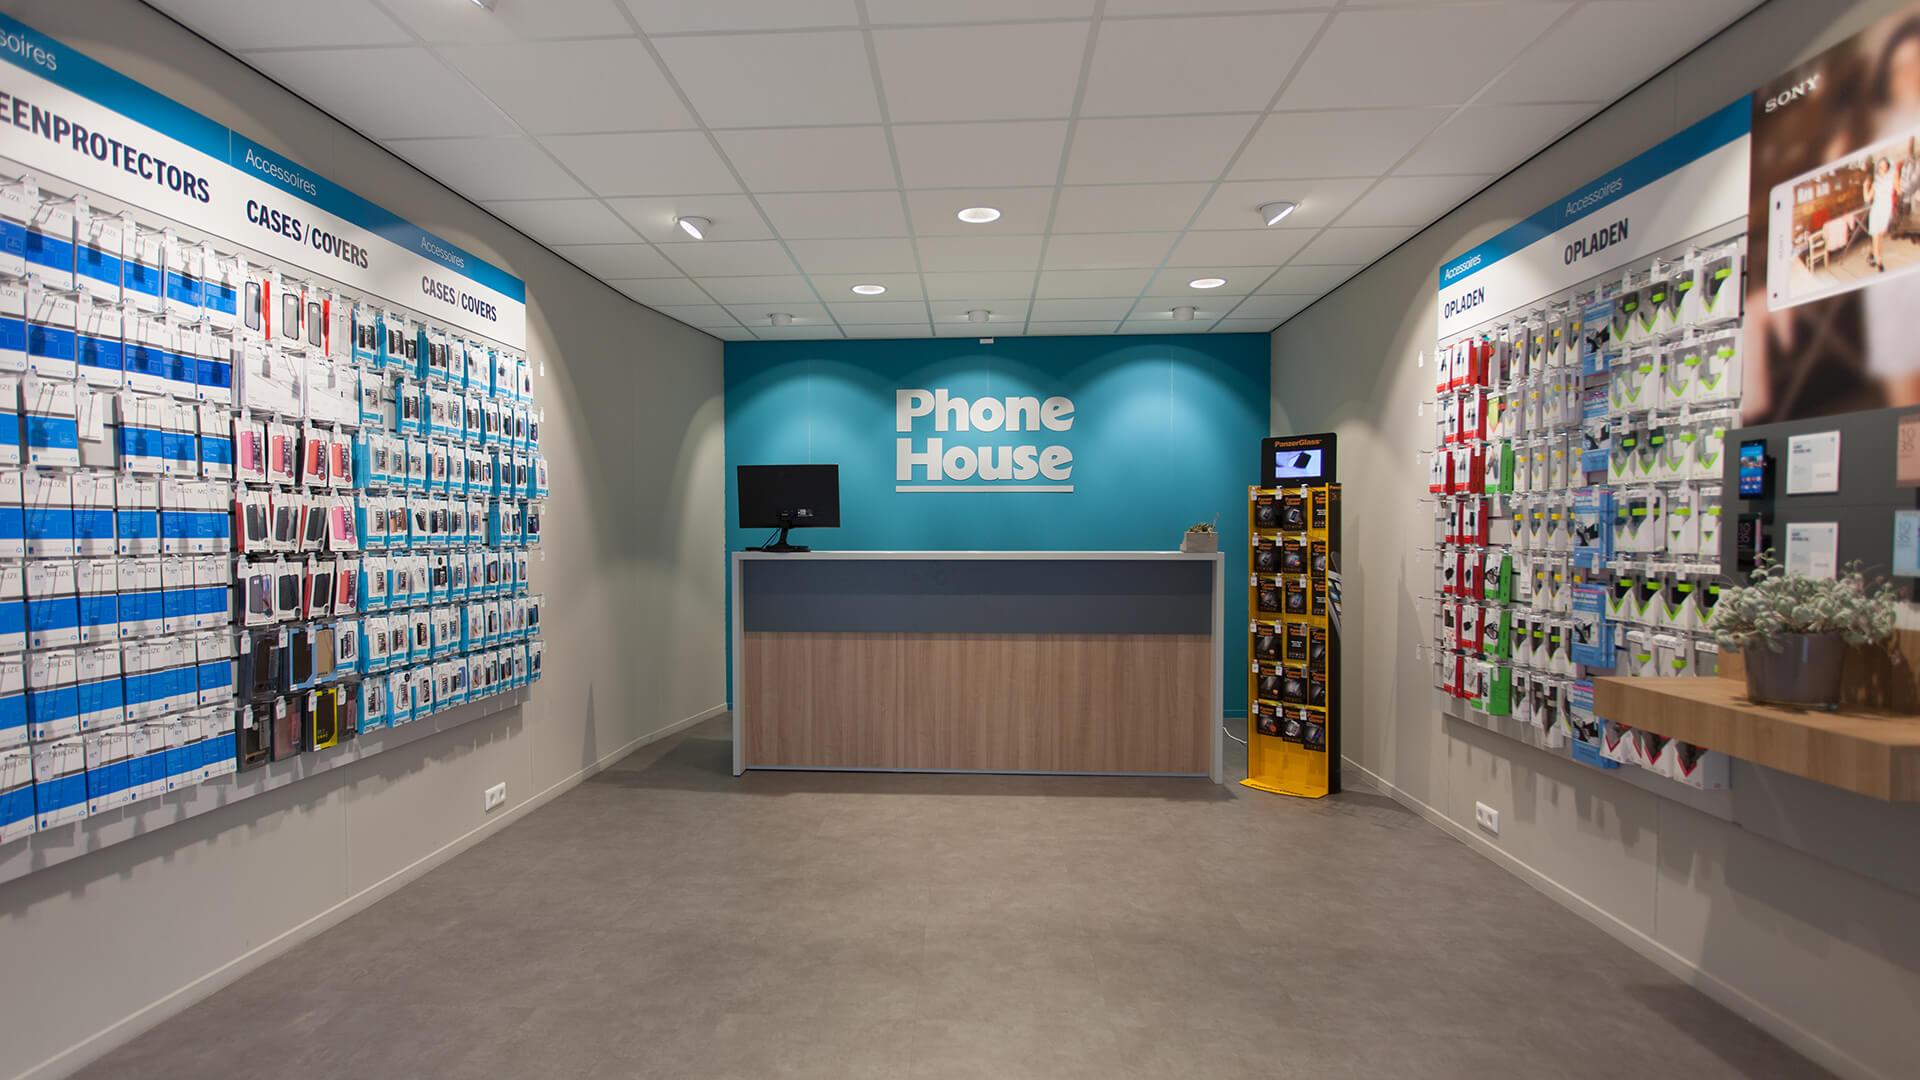 Phone-House-6.jpg